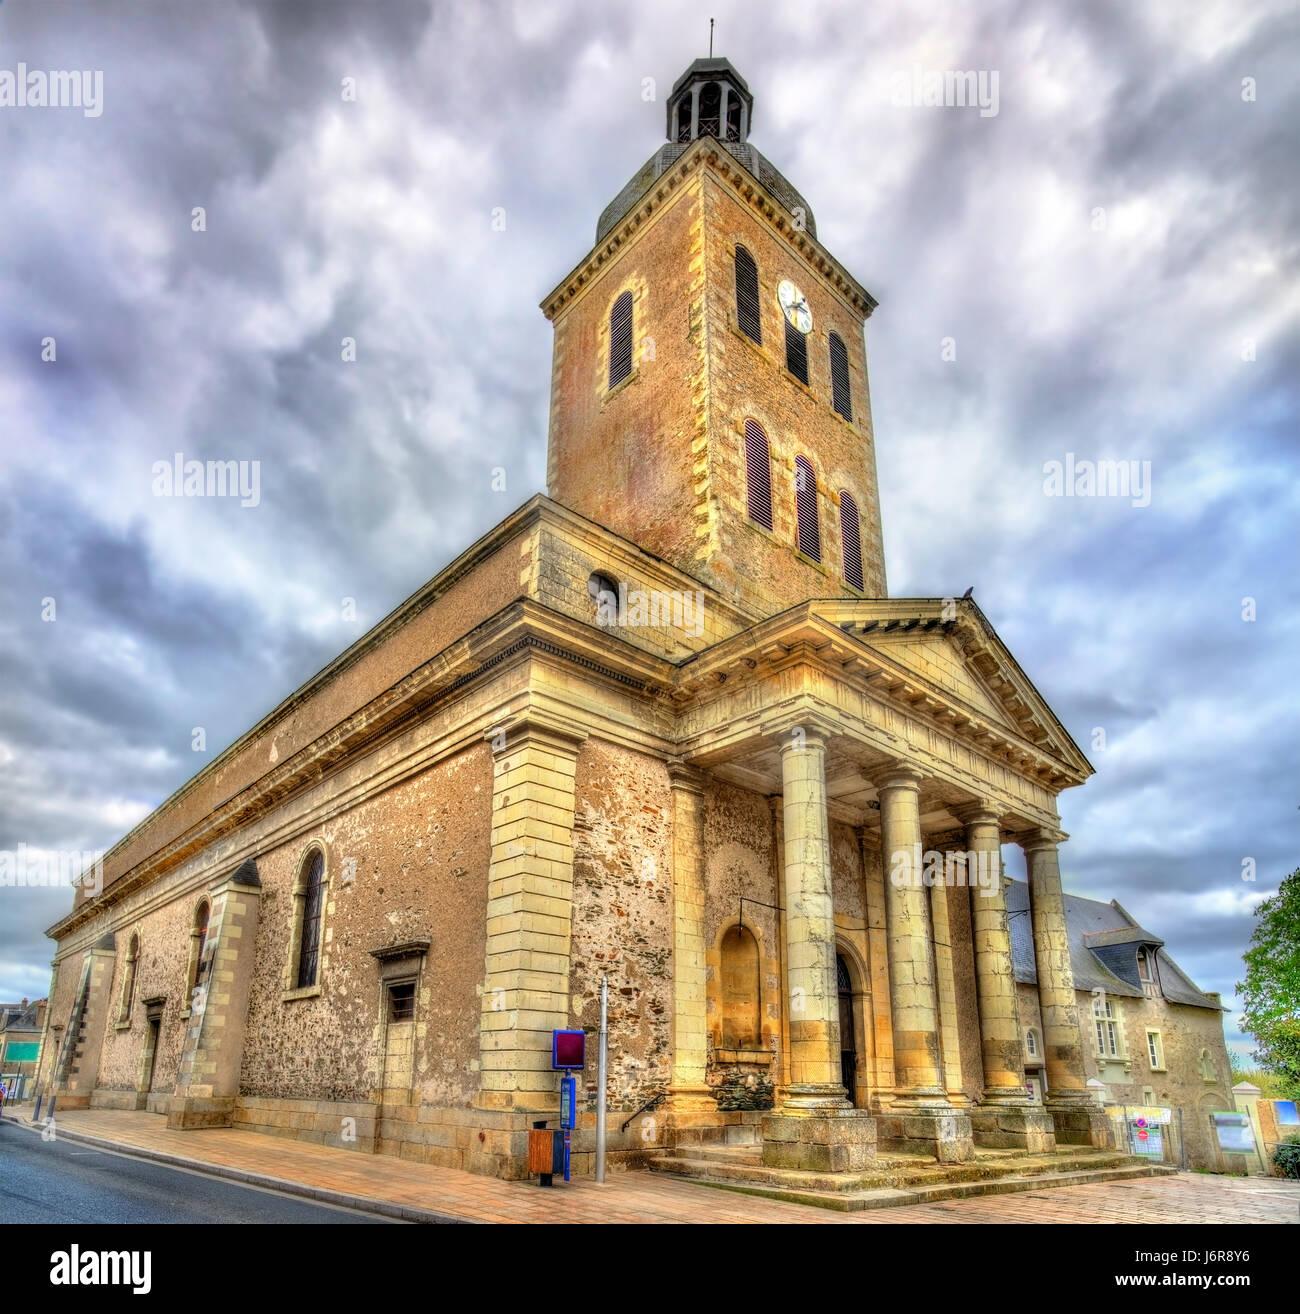 saint georges church stock photos saint georges church stock images alamy. Black Bedroom Furniture Sets. Home Design Ideas